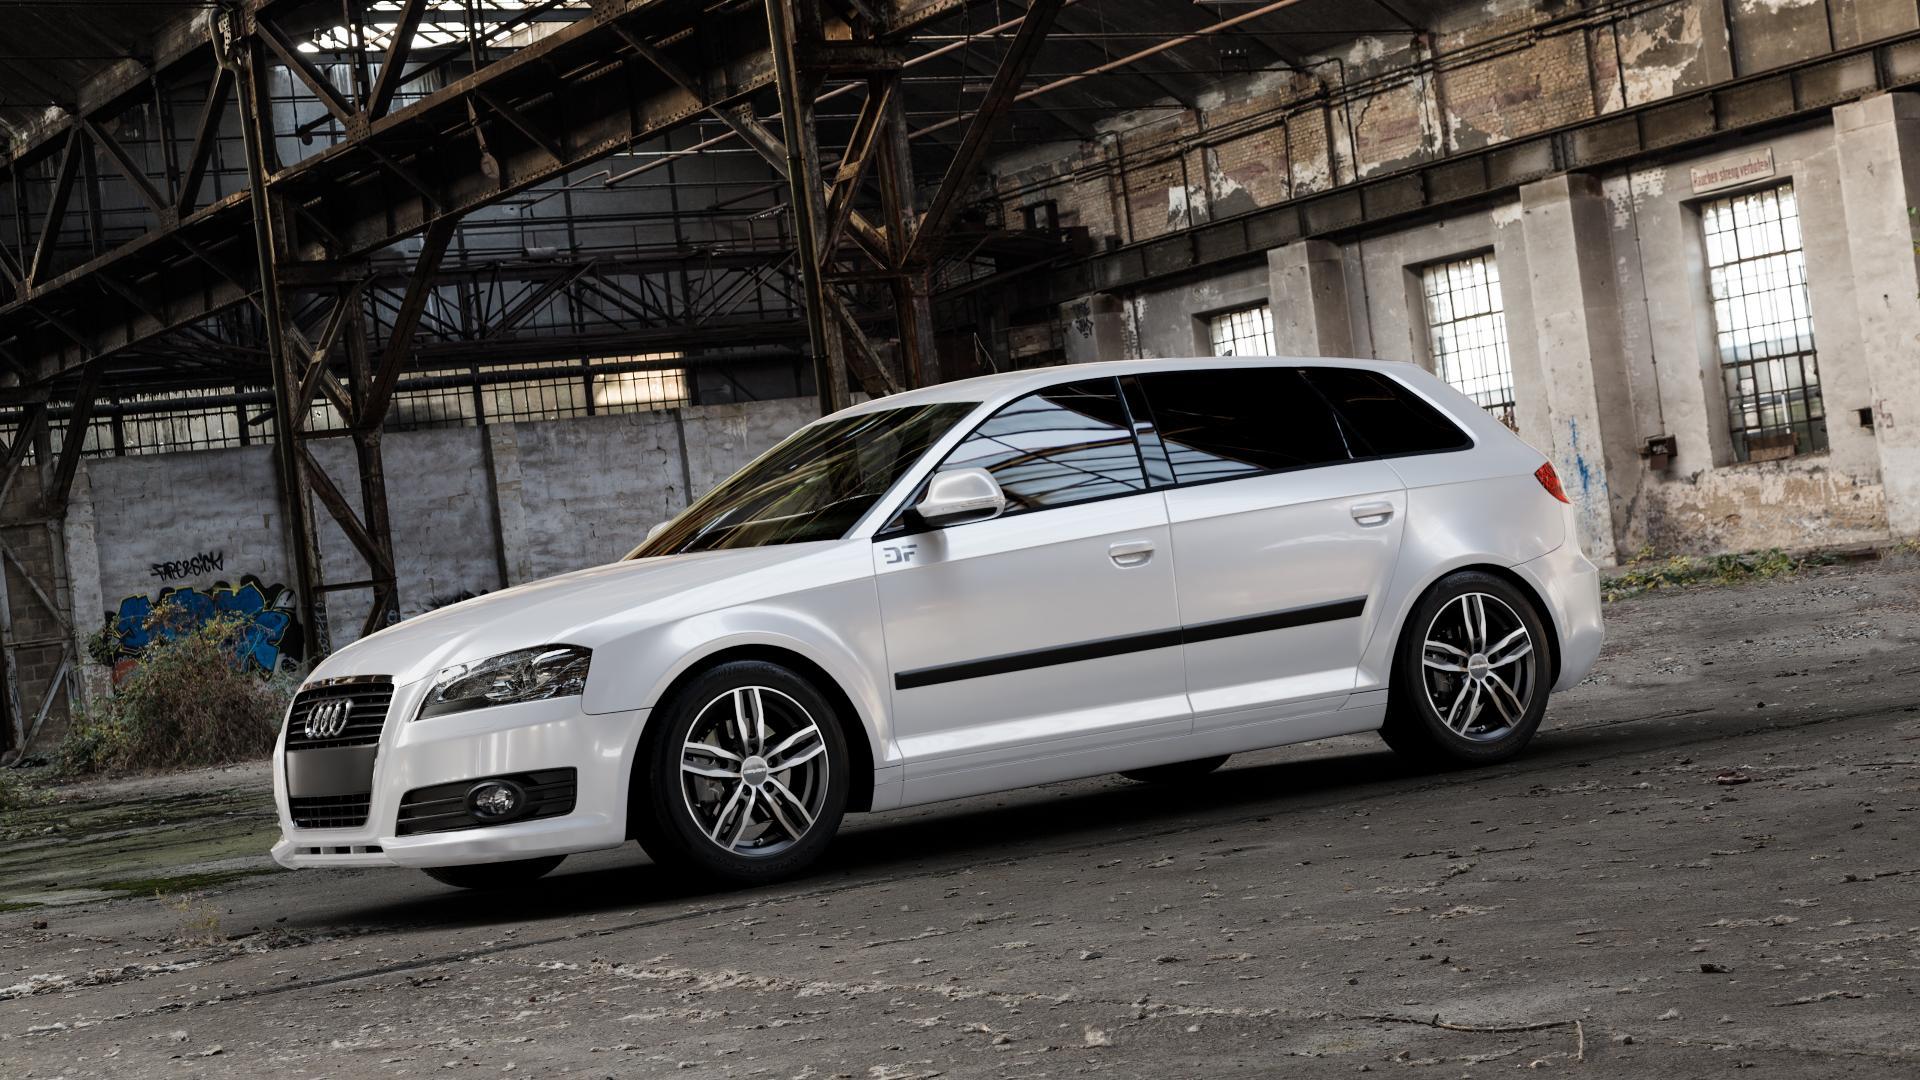 CARMANI 14 Paul black polish Felge mit Reifen silber schwarz mehrfarbig in 16Zoll Alufelge auf weissem Audi A3 Typ 8P (Sportback) 1,6l 75kW (102 PS) 2,0l FSI 110kW (150 1,9l TDI 77kW (105 103kW (140 TFSI 147kW (200 85kW (116 100kW (136 1,8l 118kW (160 125kW (170 1,4l 92kW (125 120kW (163 quattro 3,2l V6 184kW (250 S3 195kW (265 1,2l 66kW (90 18